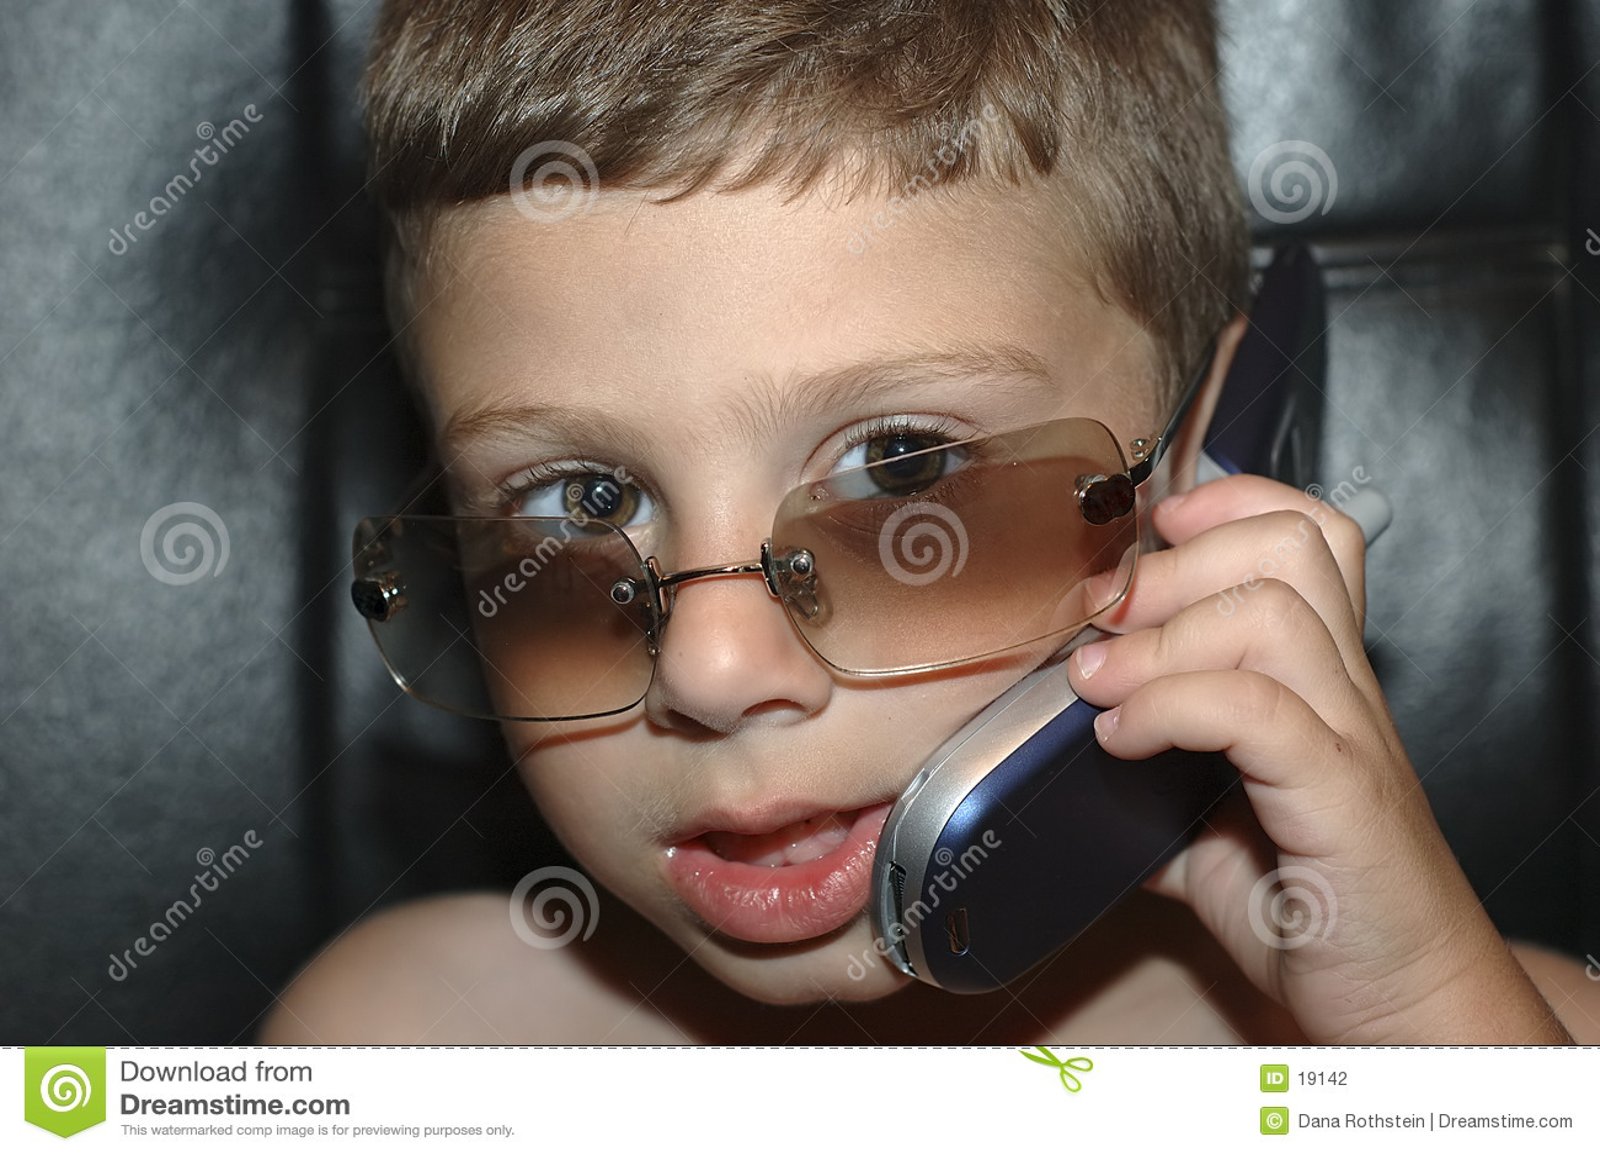 Zadzwonić do nanna